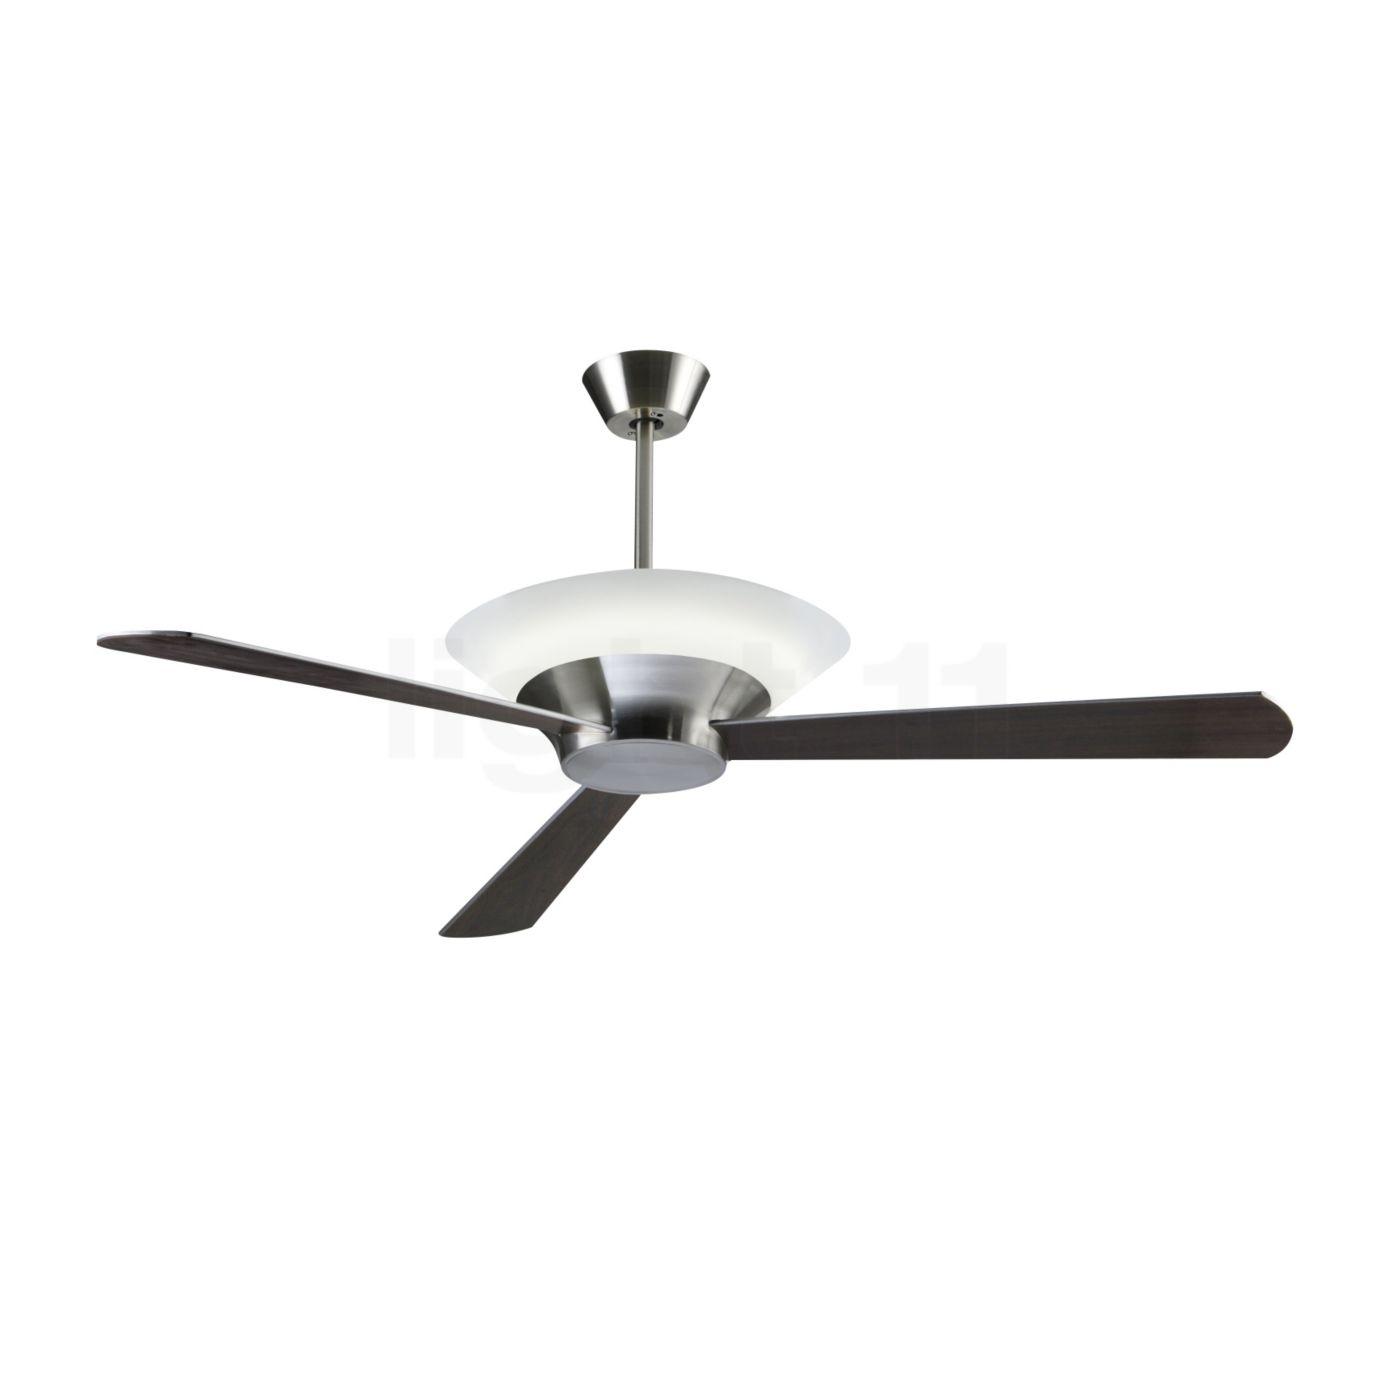 leds c4 toronto ventilator ventilatoren mit licht. Black Bedroom Furniture Sets. Home Design Ideas